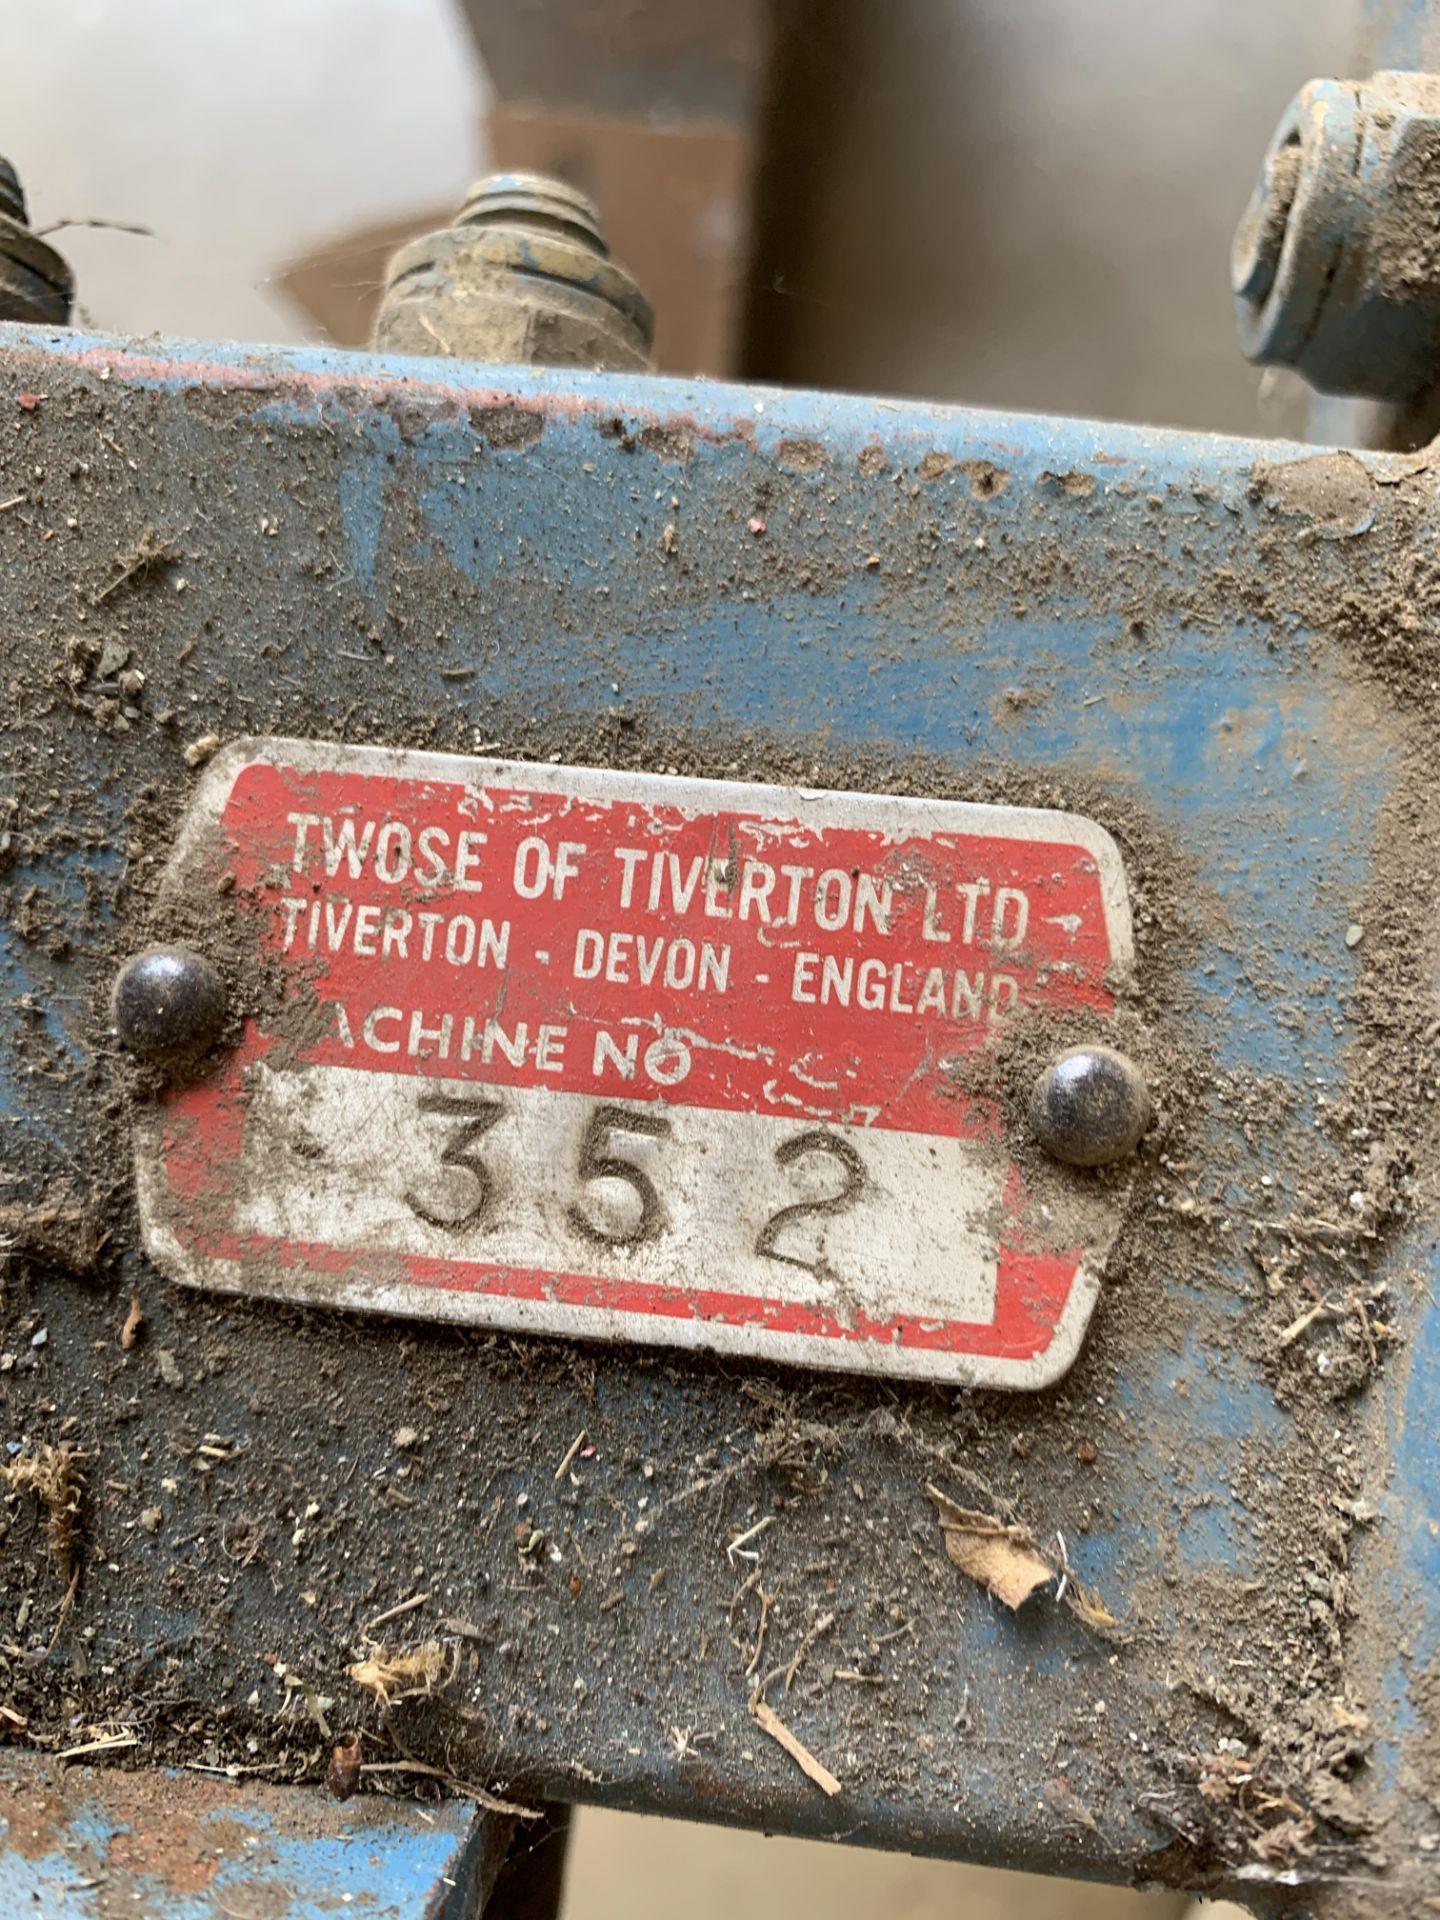 A TWOSE OF TIVERTON LTD SINGLE FURROW PLOUGH - No. - Image 4 of 6